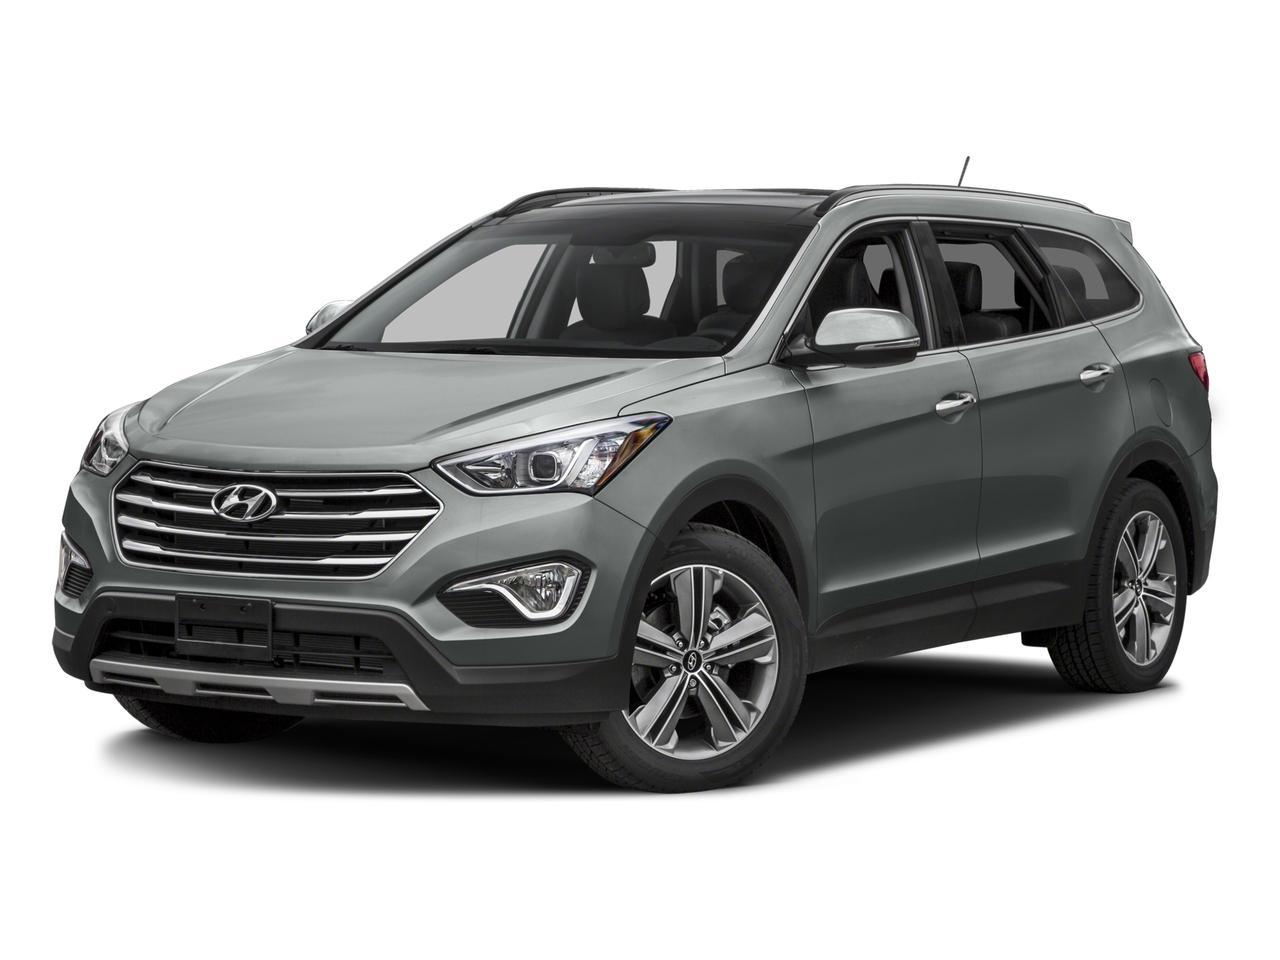 2016 Hyundai Santa Fe Vehicle Photo in Nashua, NH 03060